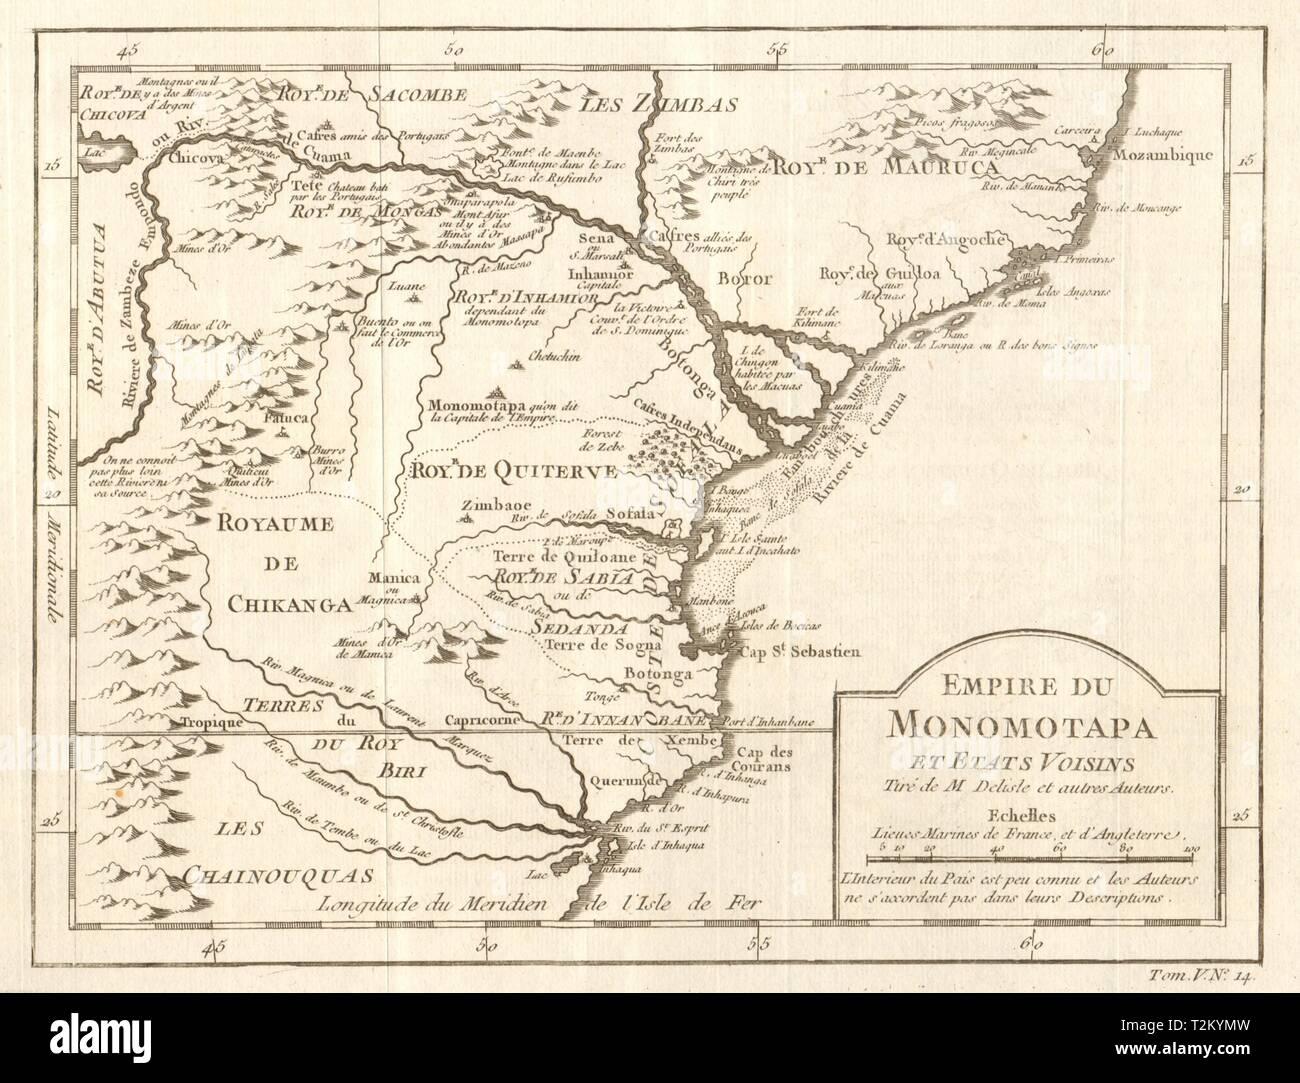 Empire de Monomotapa'. Mutapa Empire. Mozambique Kruger Park. BELLIN on sun city map, natal map, haarlem map, caprivi strip map, rio de janeiro map, brasov map, worcester map, sharm el sheikh map, london map, port elizabeth map, pietermaritzburg map, viterbo map, gauteng map, johannesburg map, arusha map, limpopo map, democratic republic of congo map, lviv map, cape town map, garden route map,